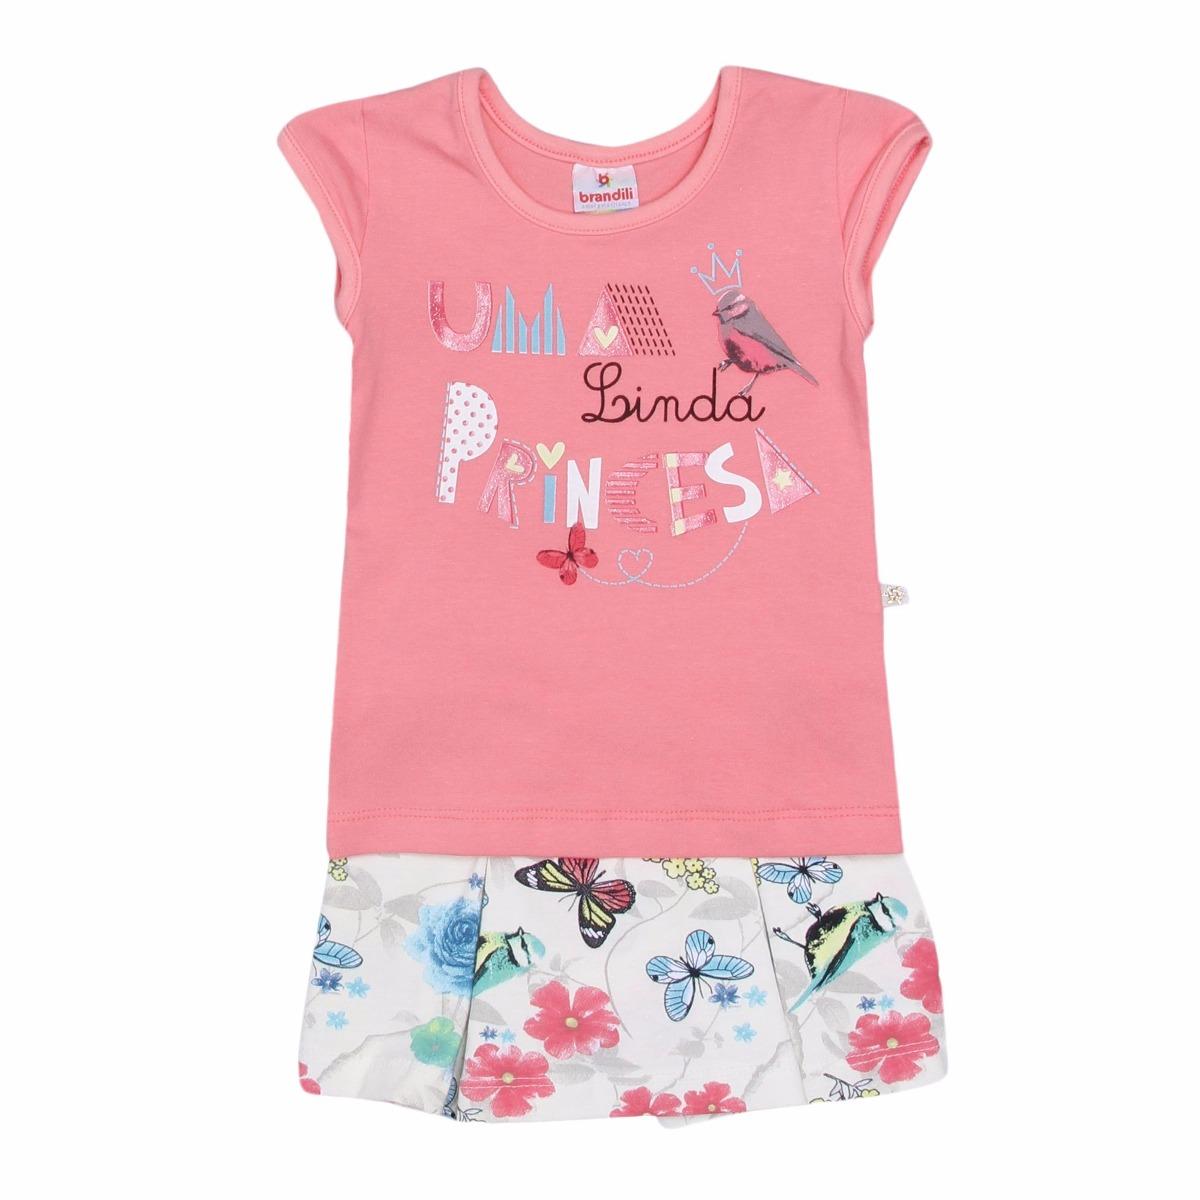 8c93b4fbaf Conjunto Brandili Infantil Blusa + Short Saia Floral - G - R  59